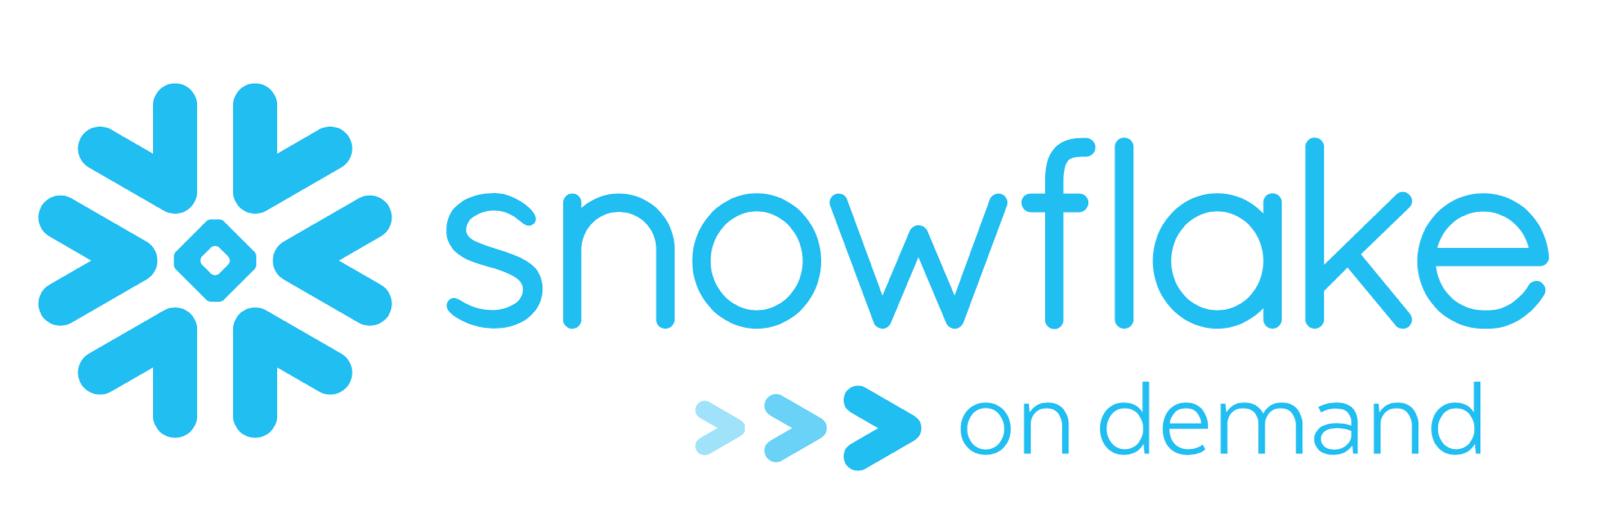 aws marketplace snowflake on demand premier